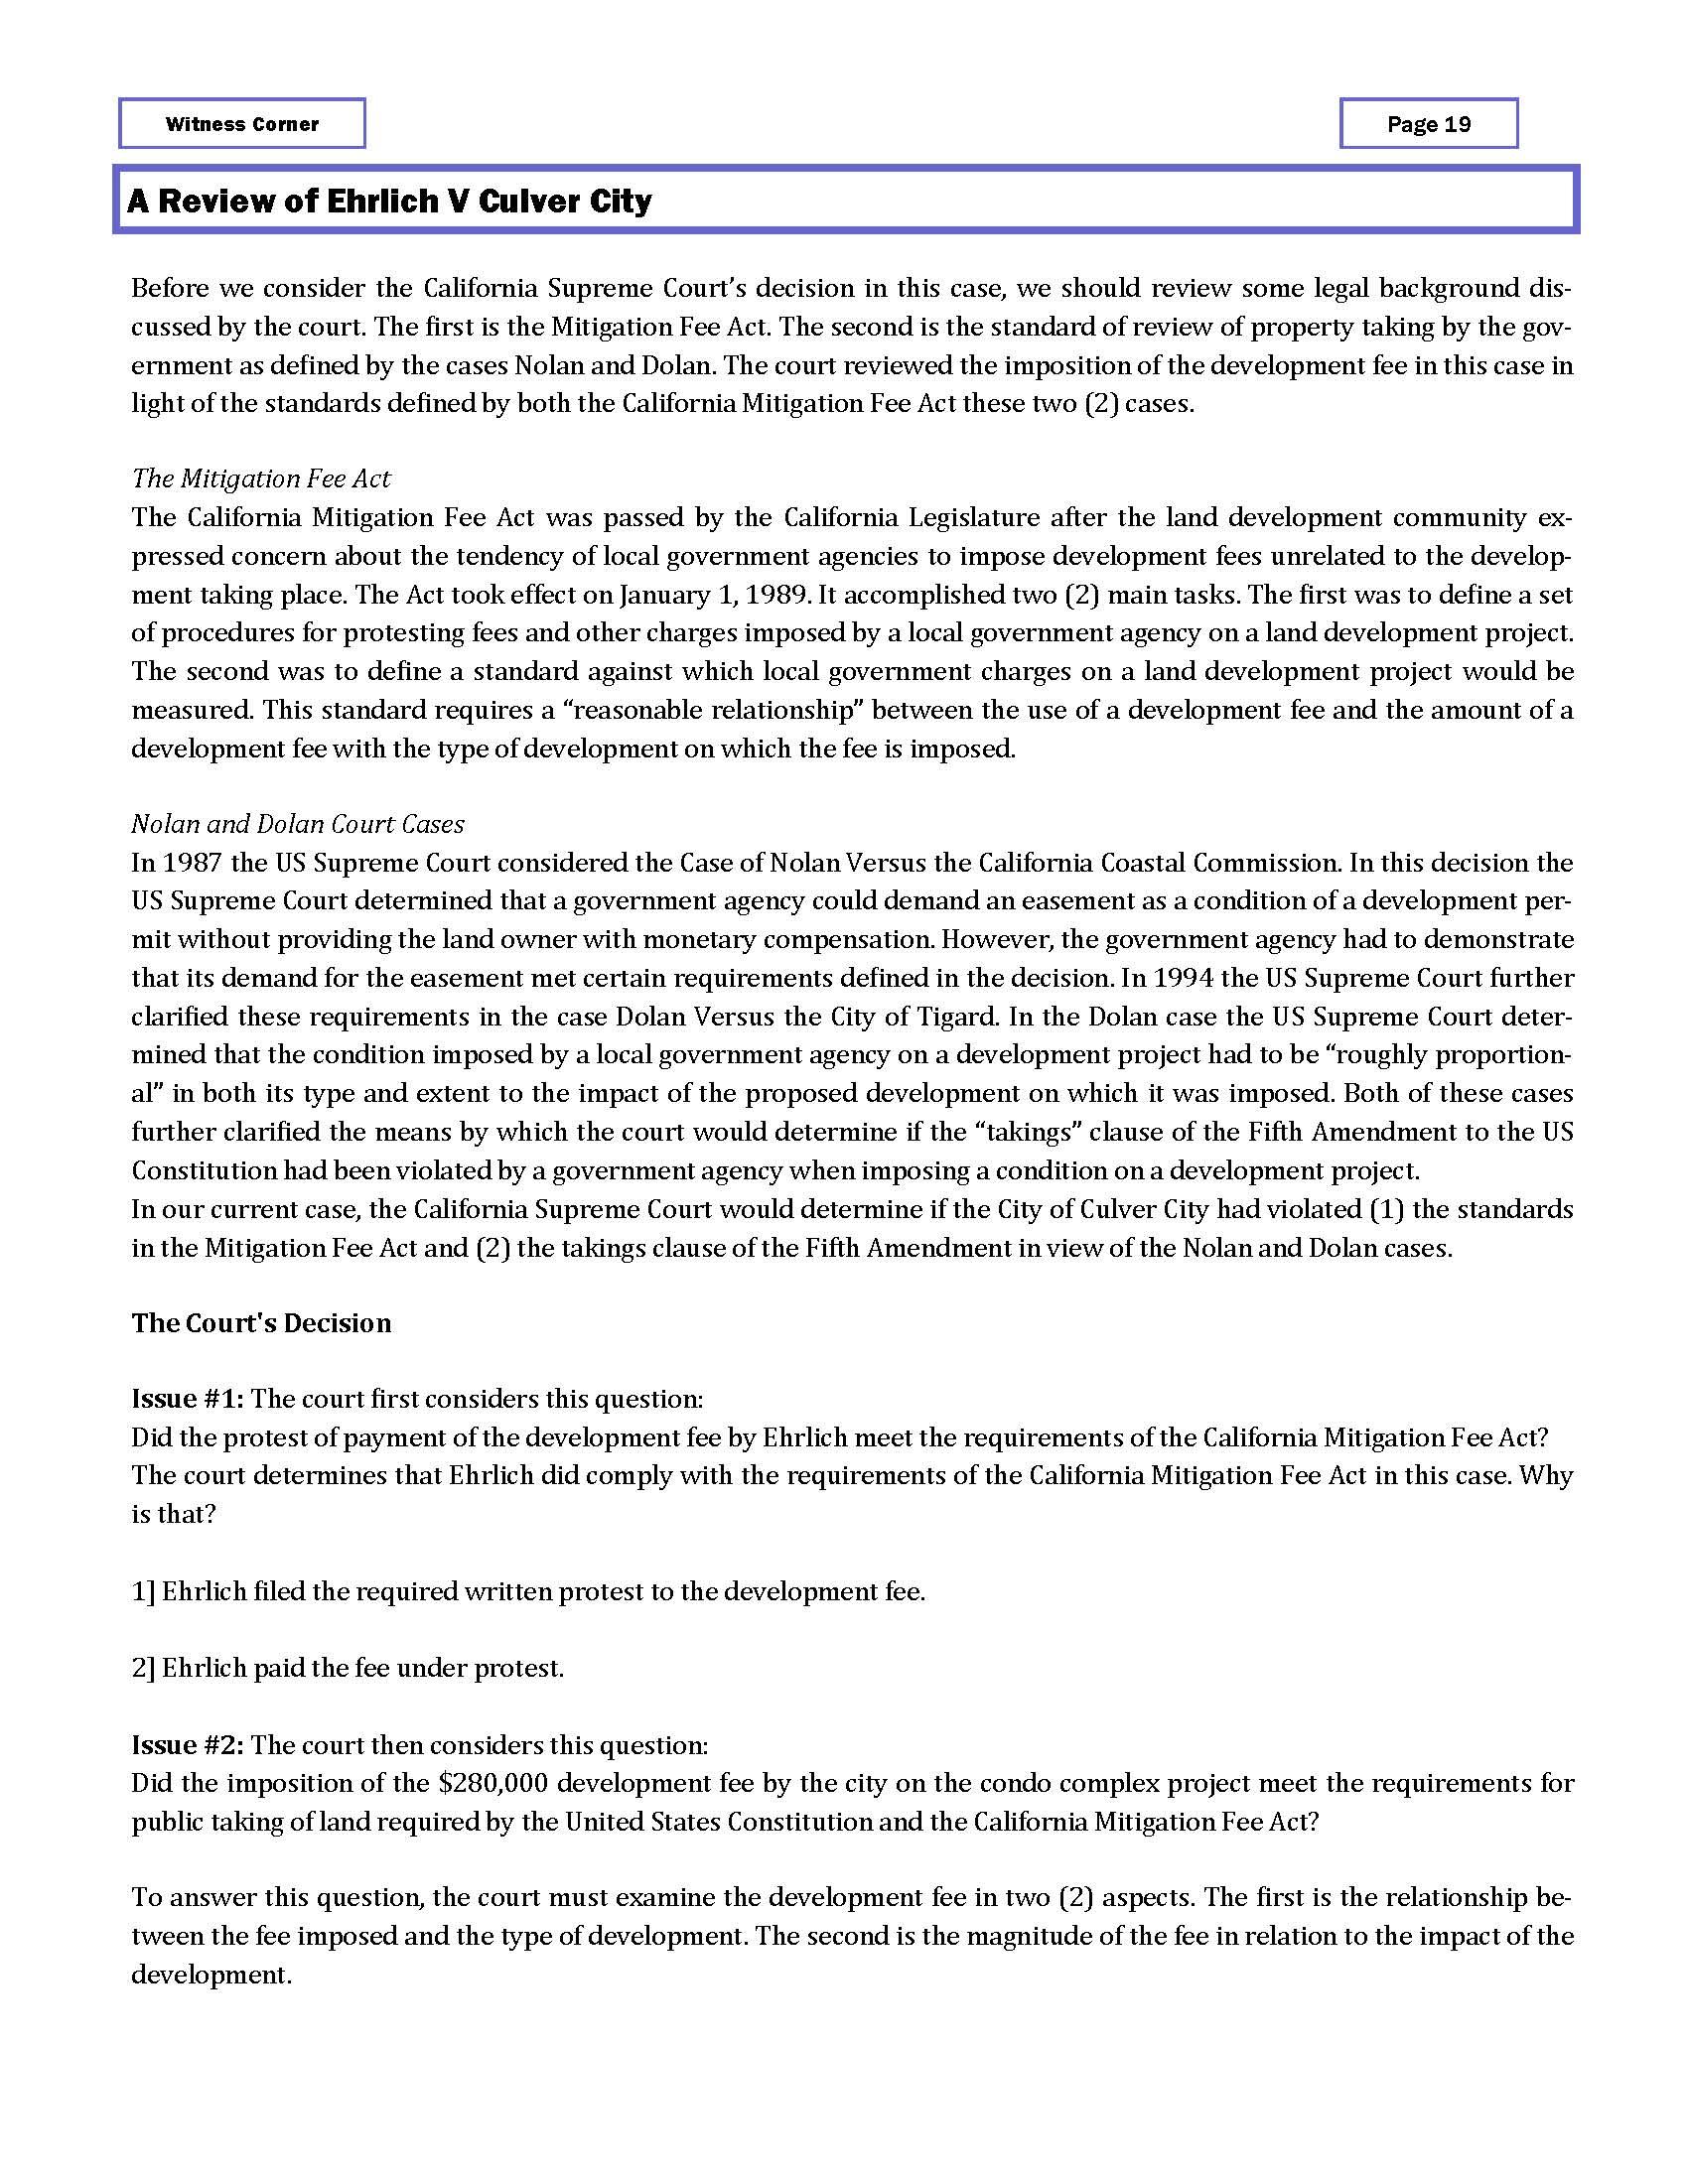 OC-CLSA 082015 Newsletter_Page_22.jpg